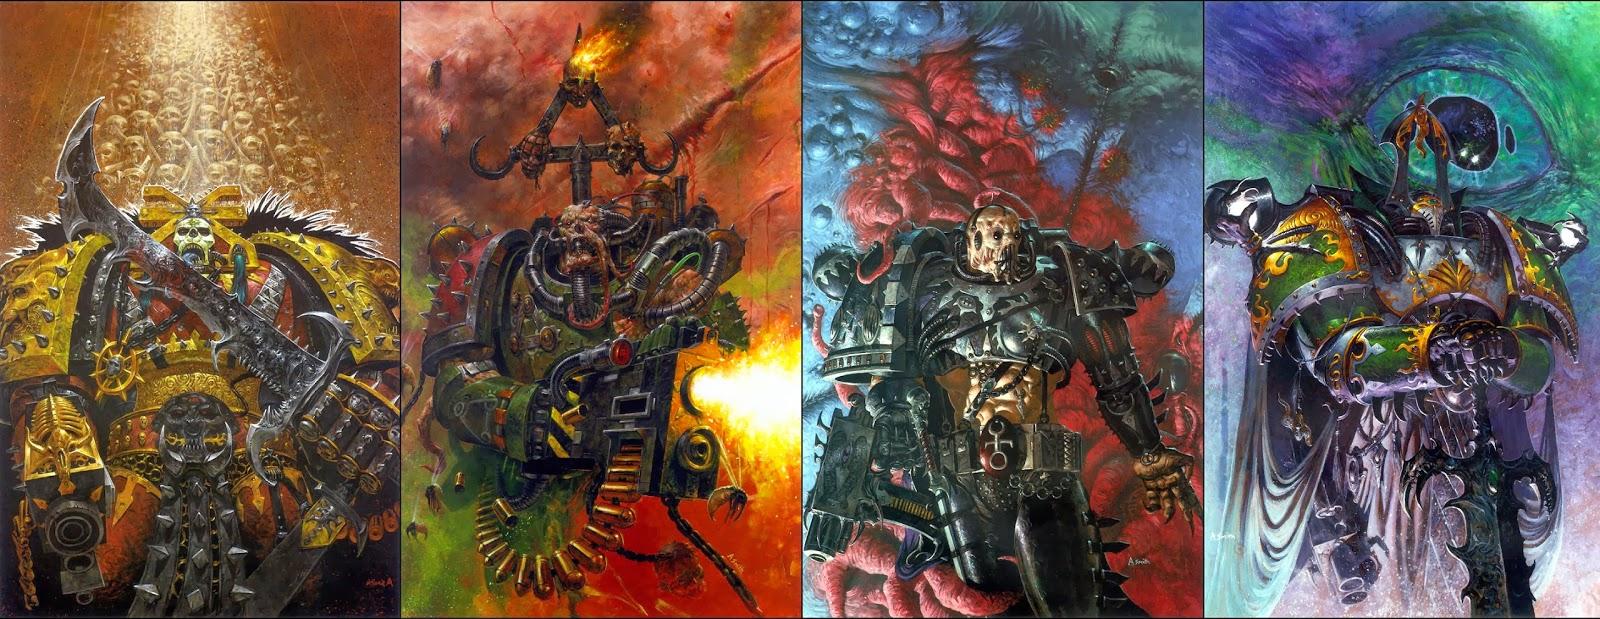 Chaos Marine Box Sets pt 4 Icons and Marks of the GodsWarhammer 40k Chaos Gods